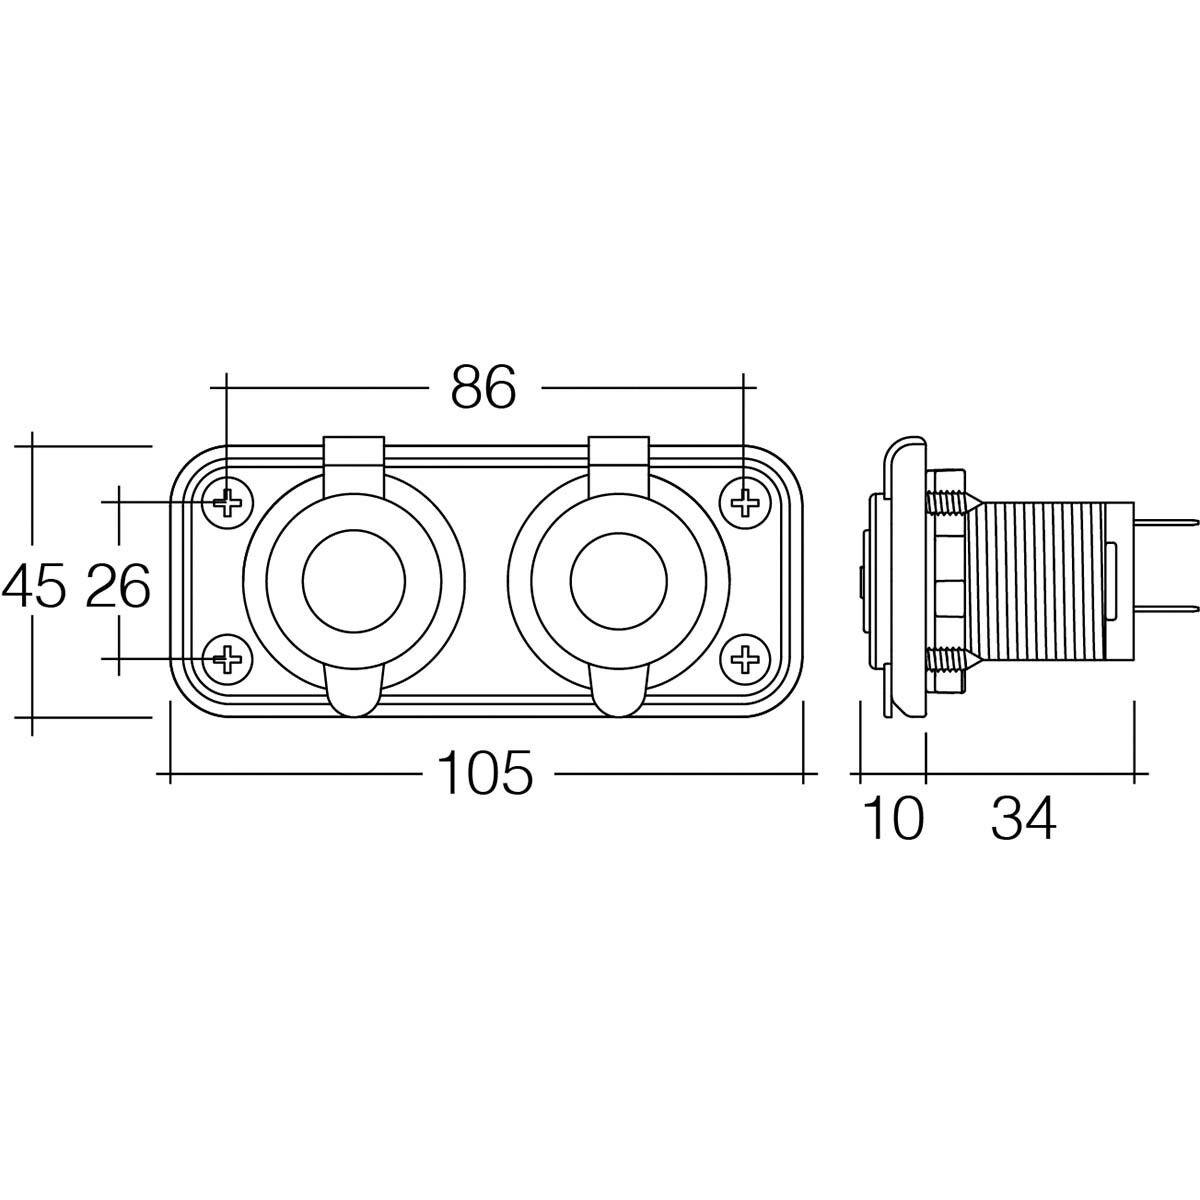 12 24v twin accessory usb socket heavy duty acc dual usb [ 1000 x 1000 Pixel ]